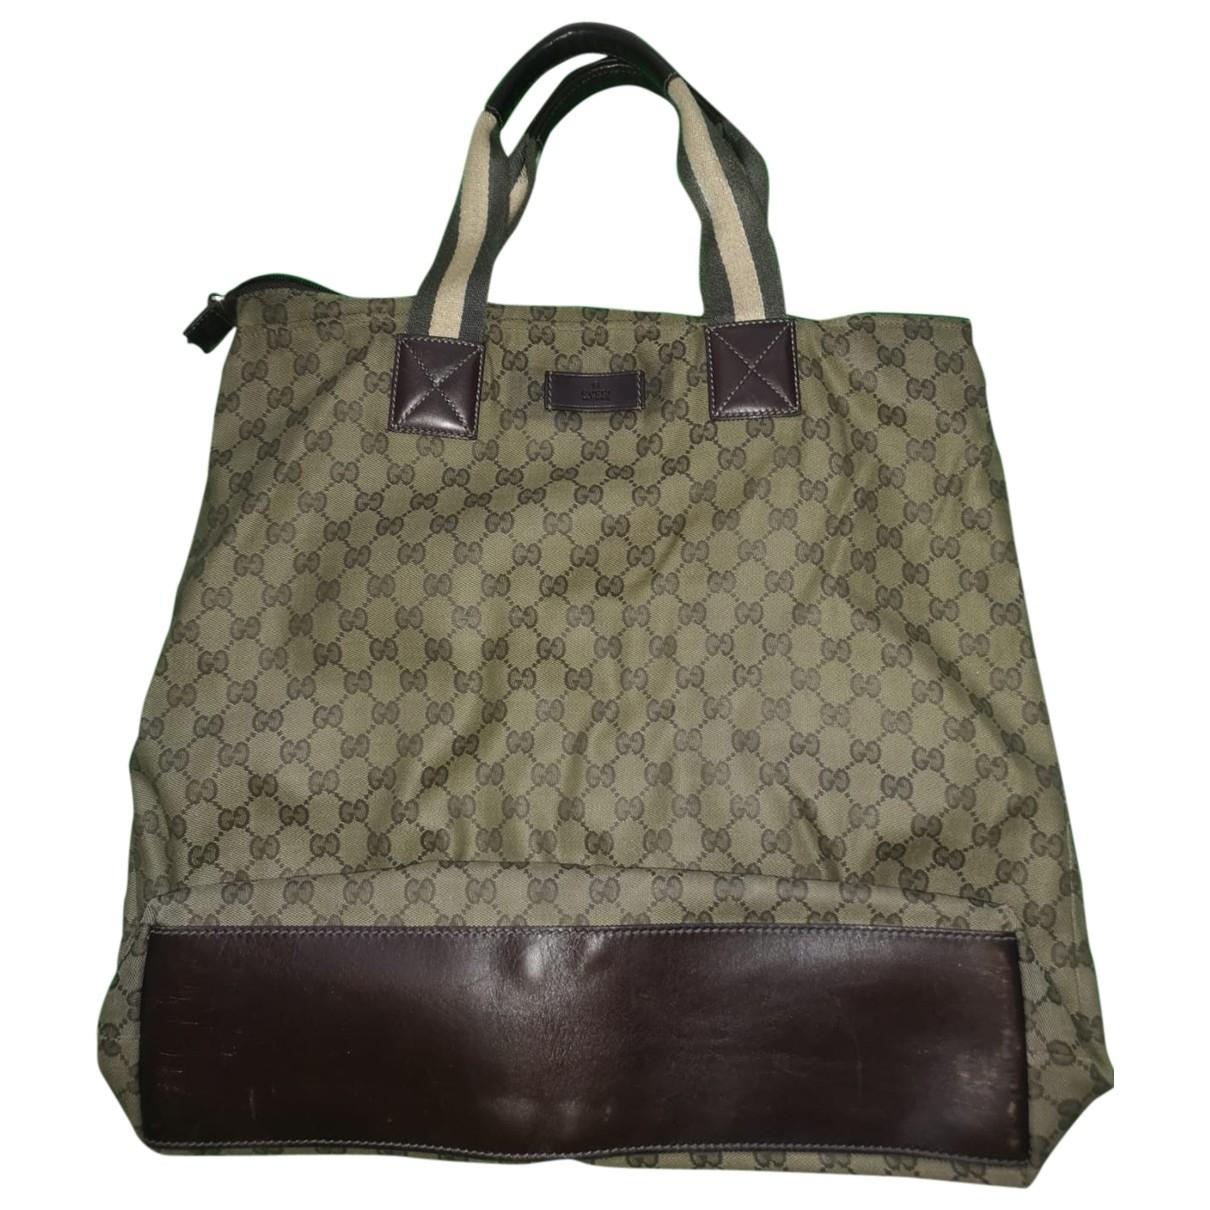 Gucci \N Green Cloth handbag for Women \N